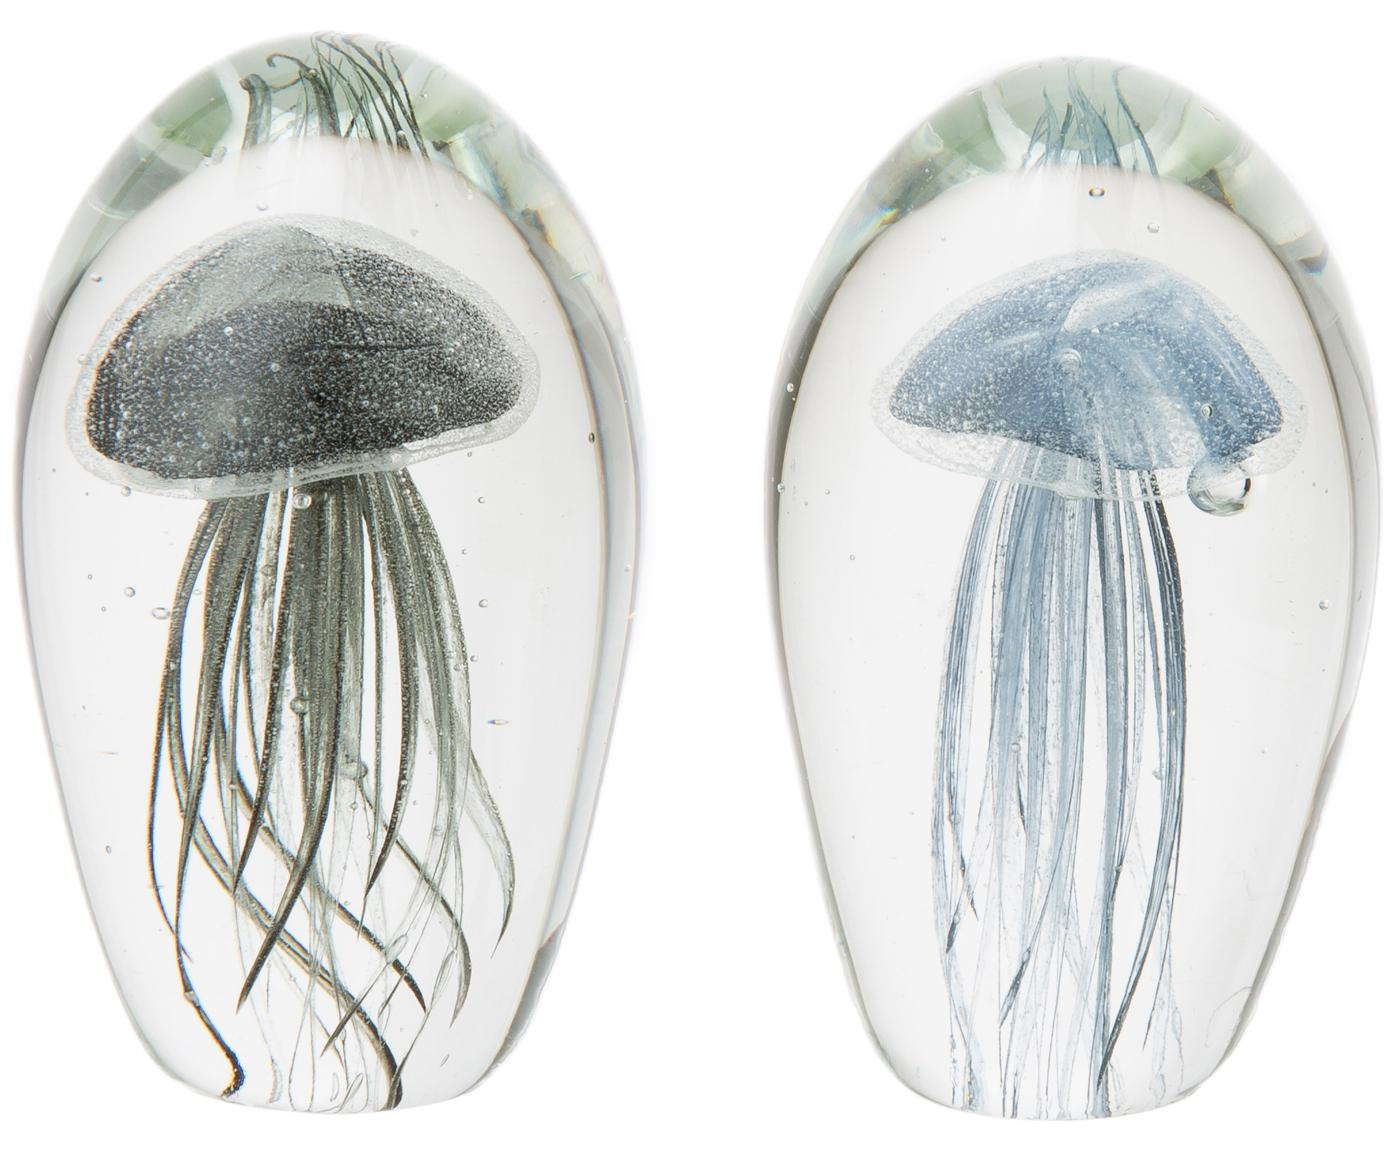 Set fermacarte Medusa, 2 pz., Vetro colorato, Fermacarte: trasparente Meduse: grigio blu, nero, Ø 8 x Alt. 12 cm